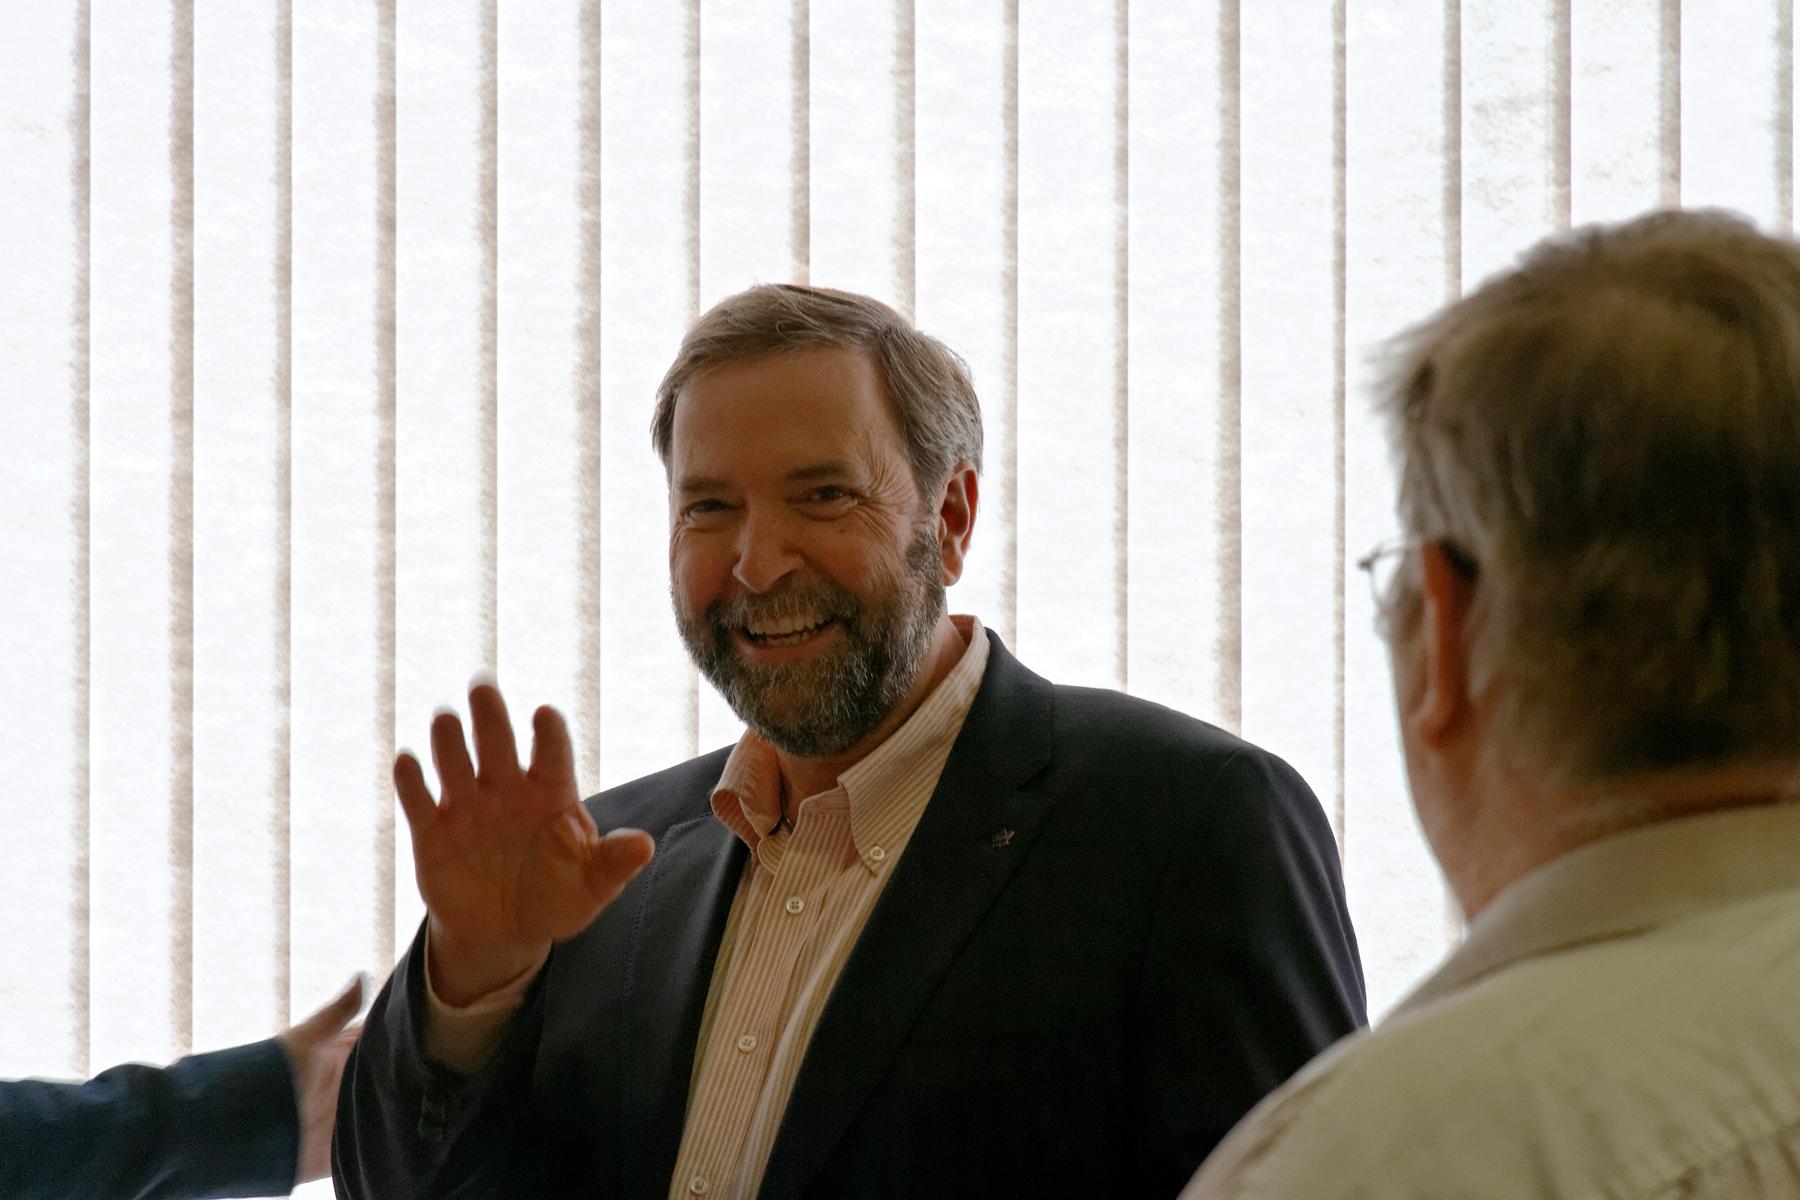 Tom Mulcair, Leader Federal NDP